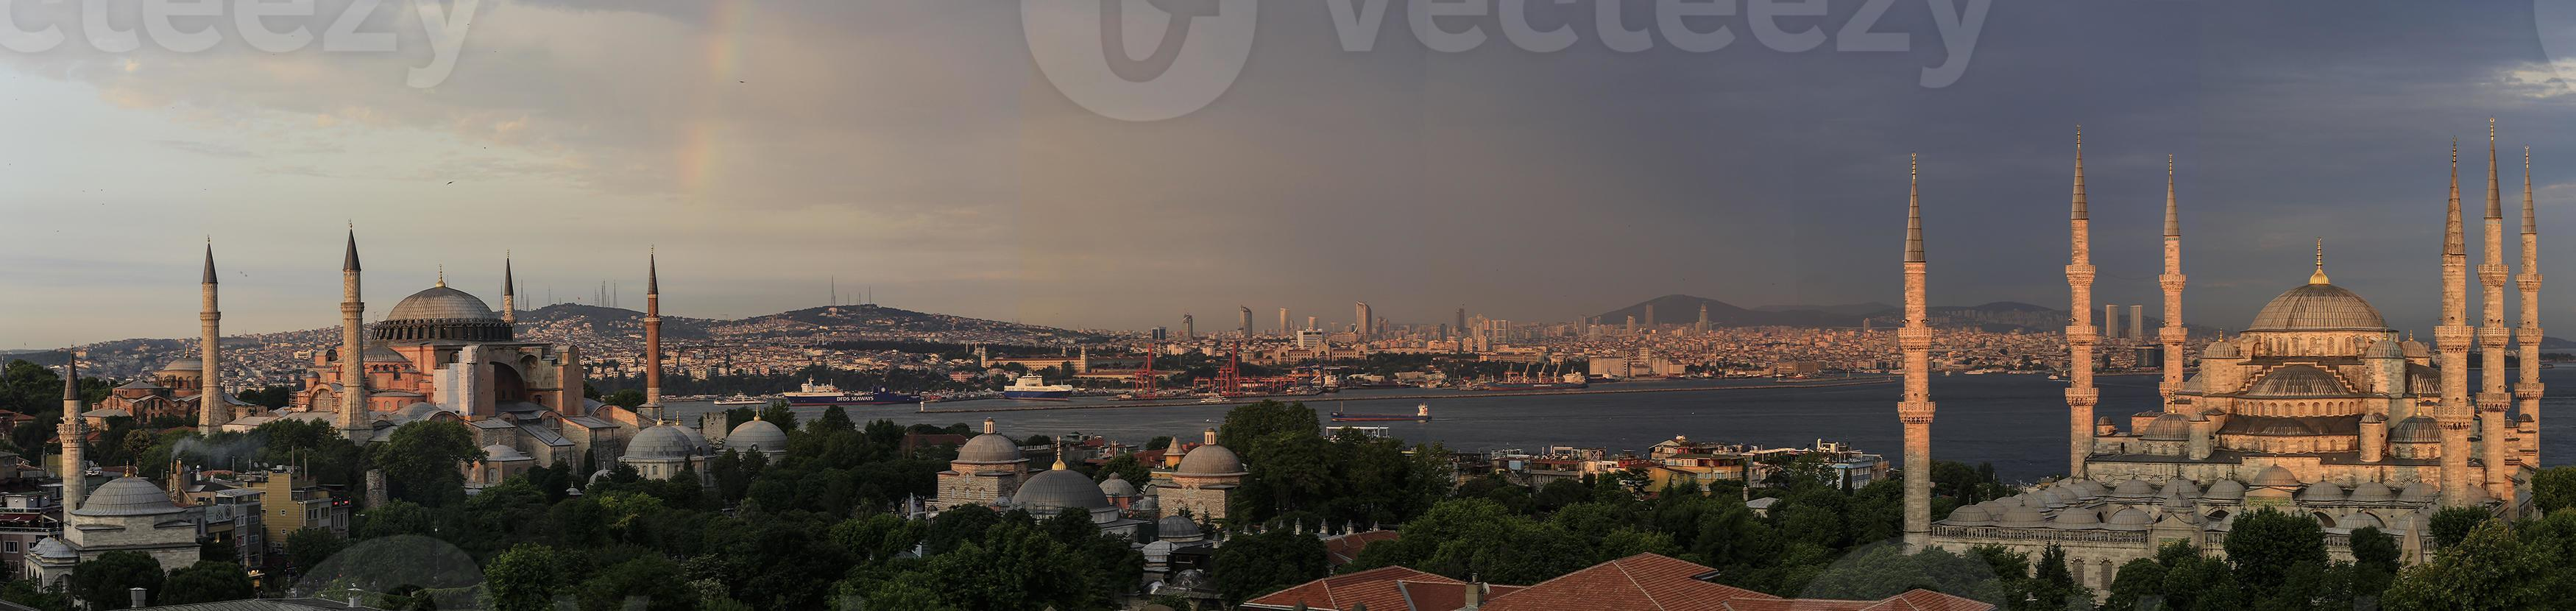 Sultan Ahmet mosque and Hagia Sofia photo